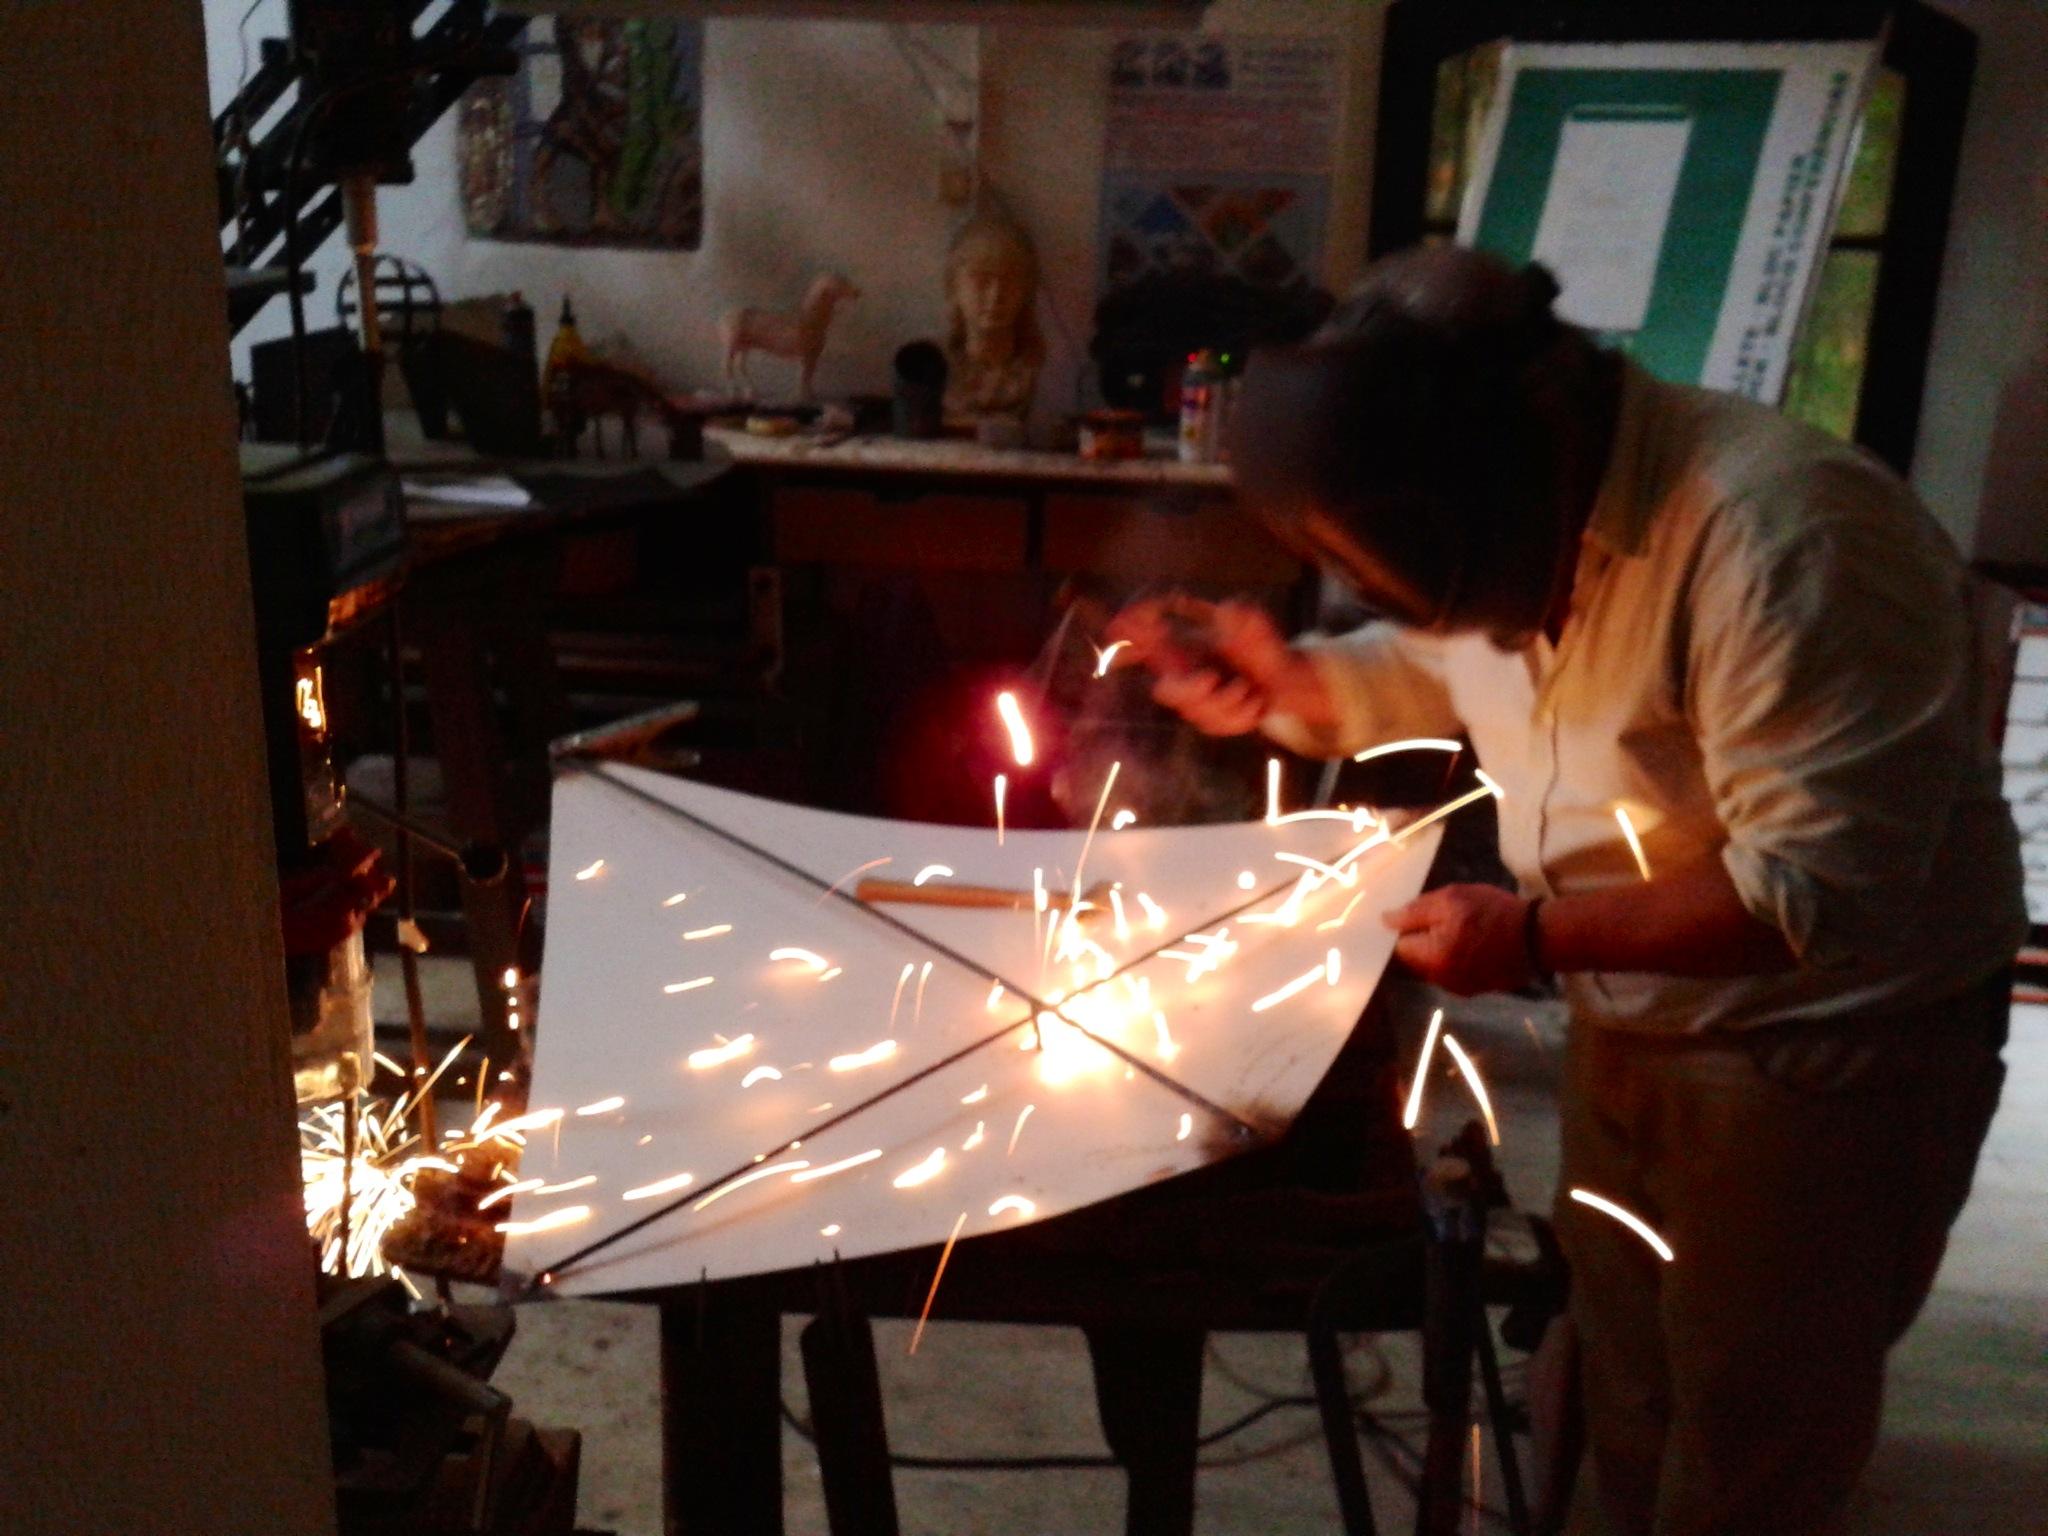 Kites Construction 004.JPG